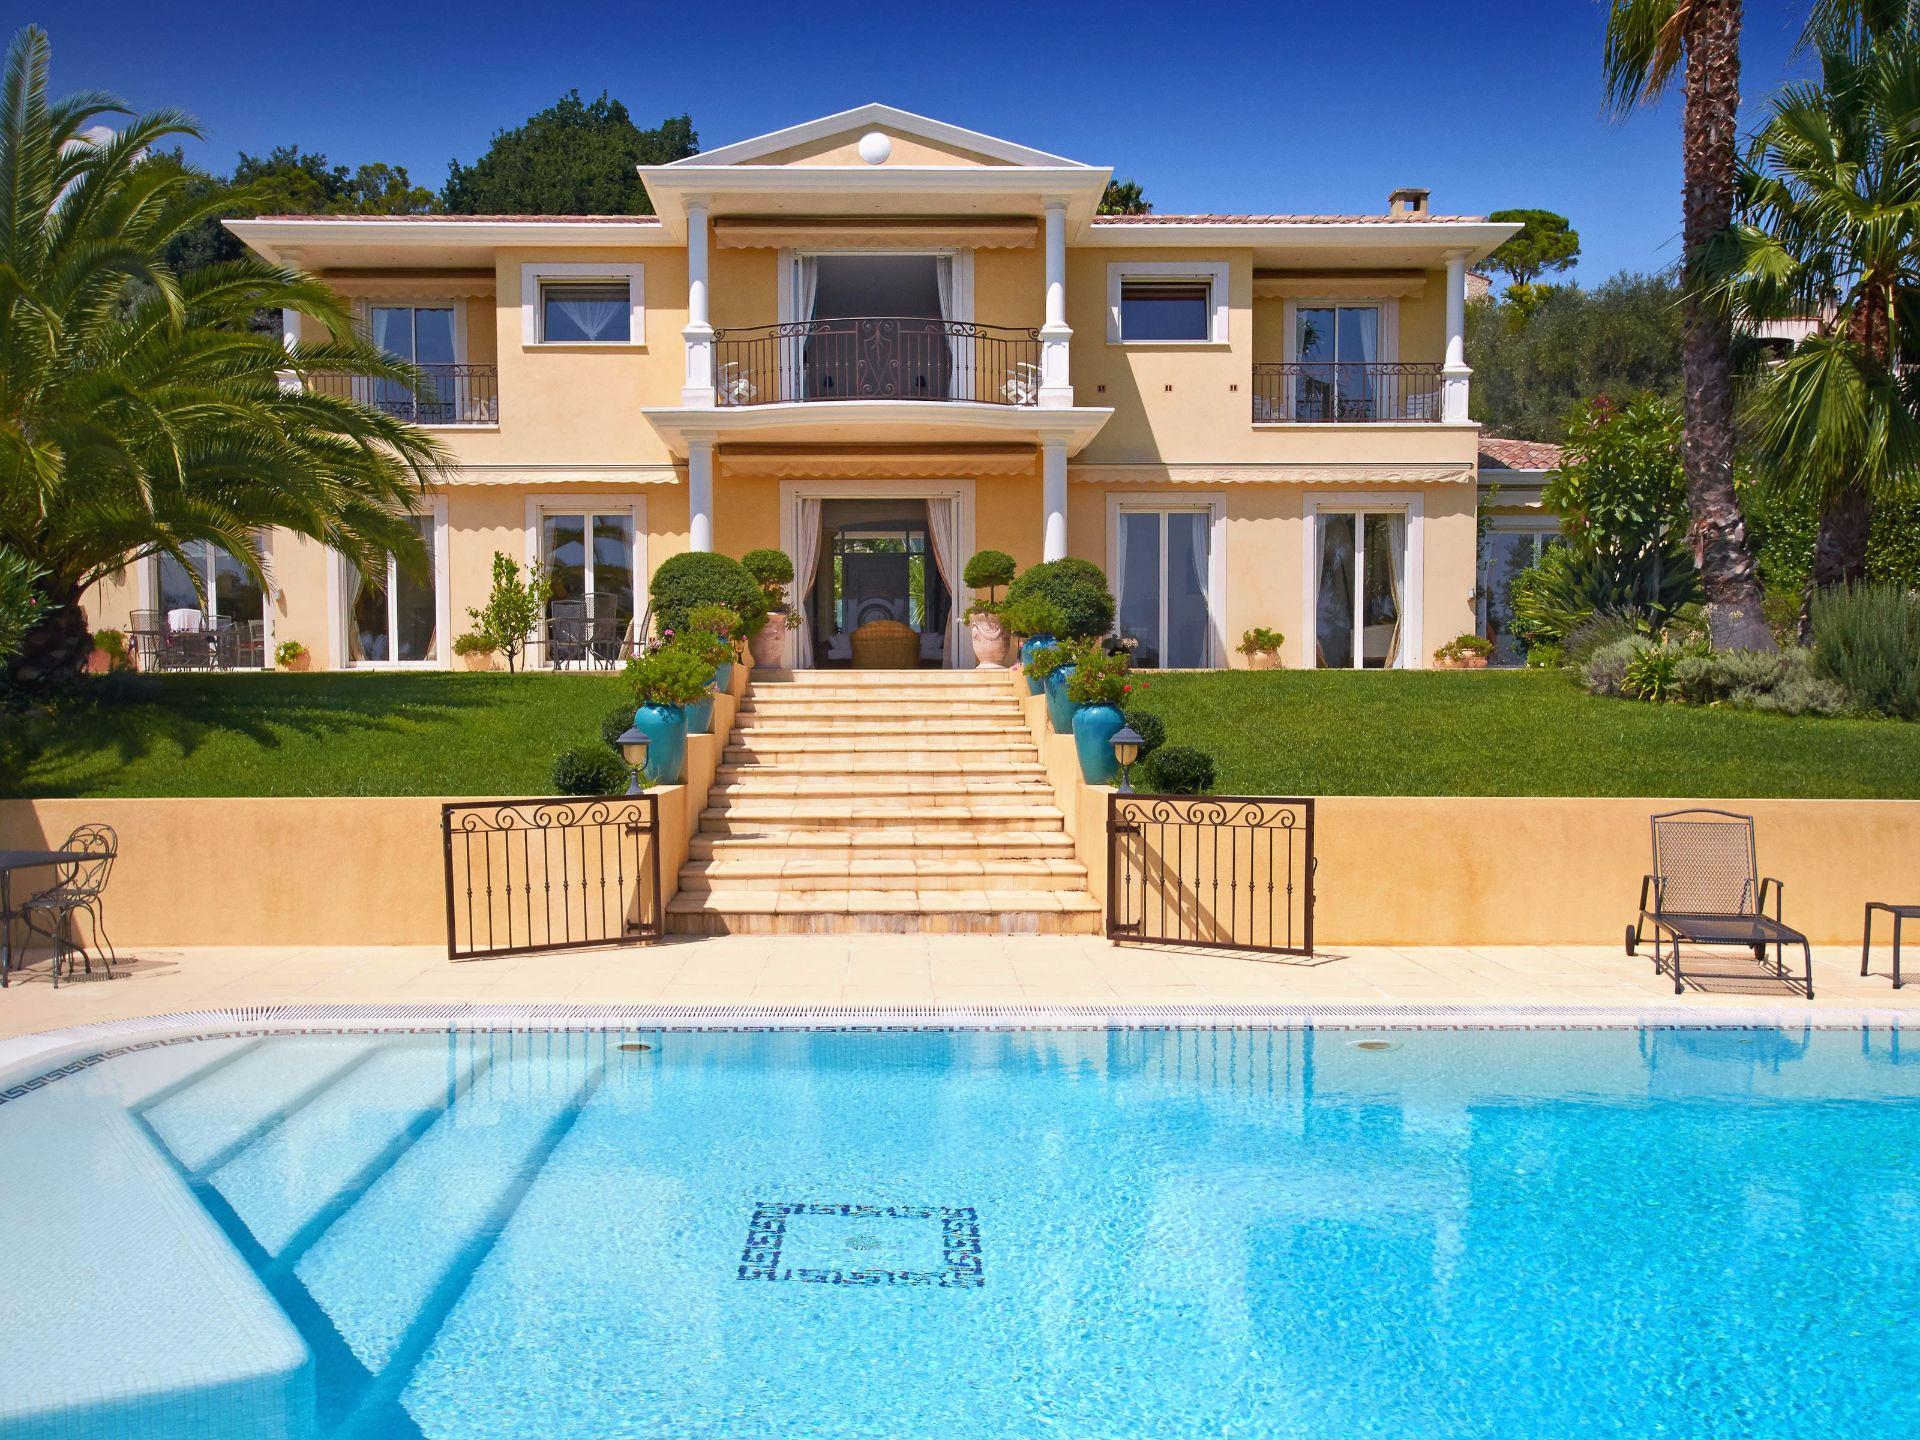 Single Family Home for Sale at Villa Mougins, Provence-Alpes-Cote D'Azur, 06250 France